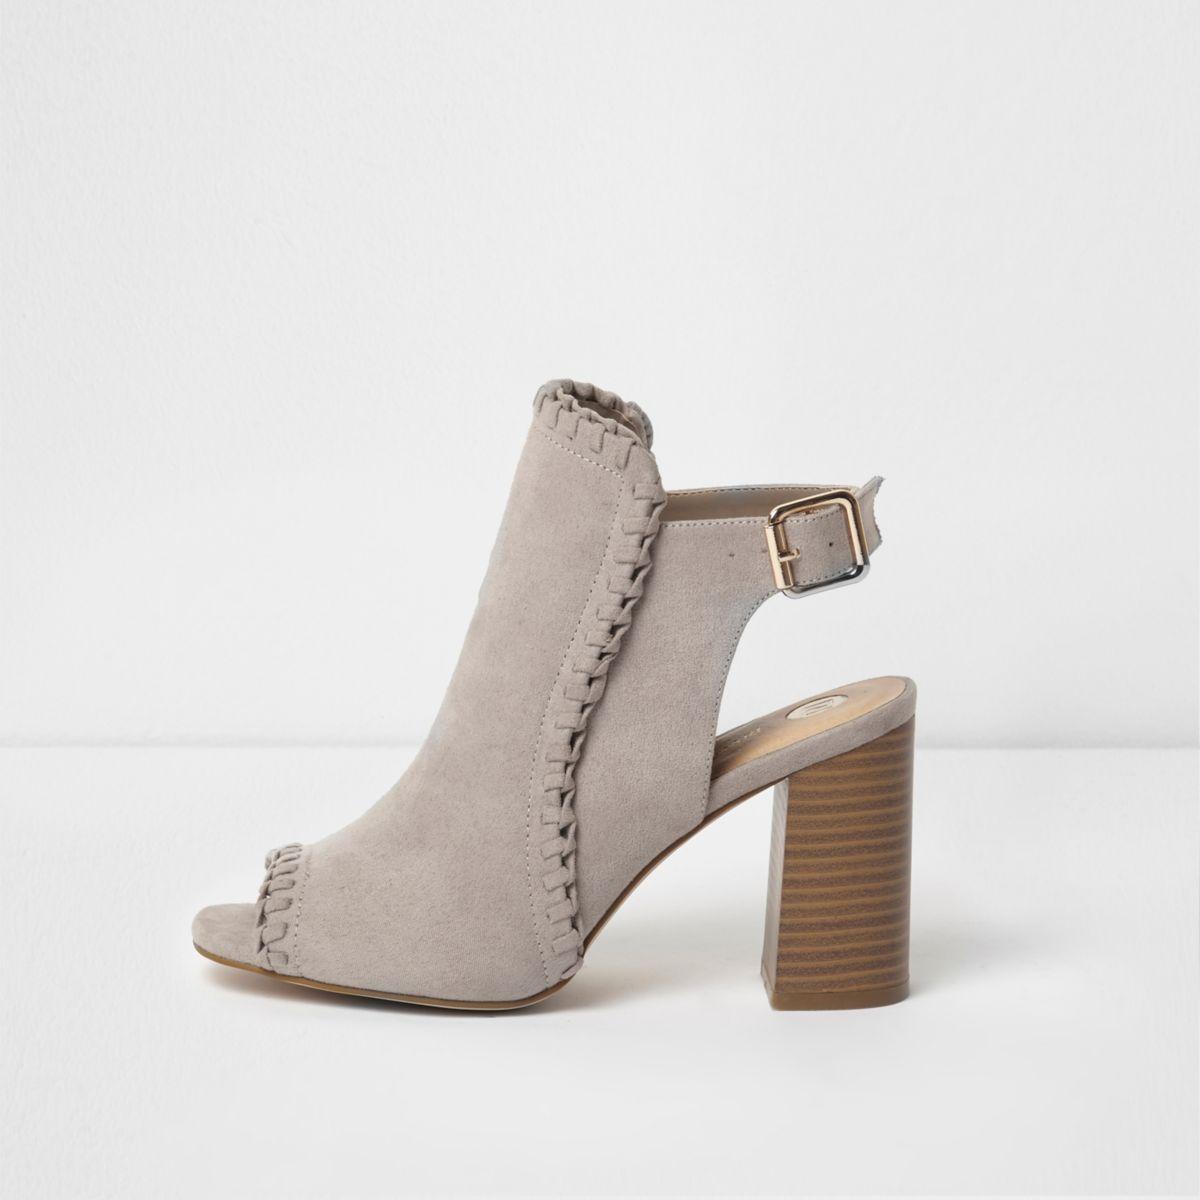 Beige peeptoe-schoenlaarsjes met blokhak